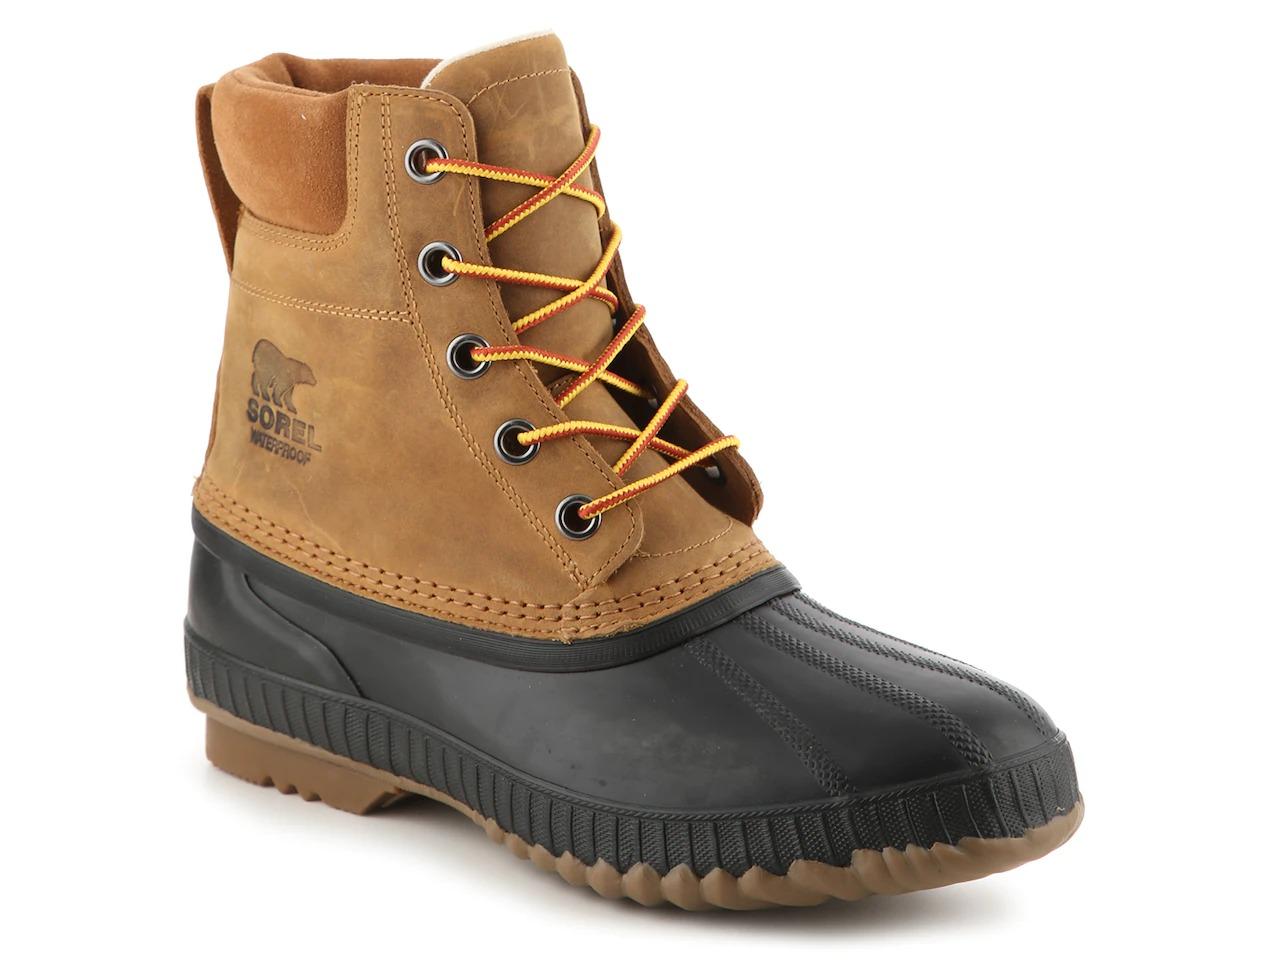 Sorel Cheyanne II Snow Boot